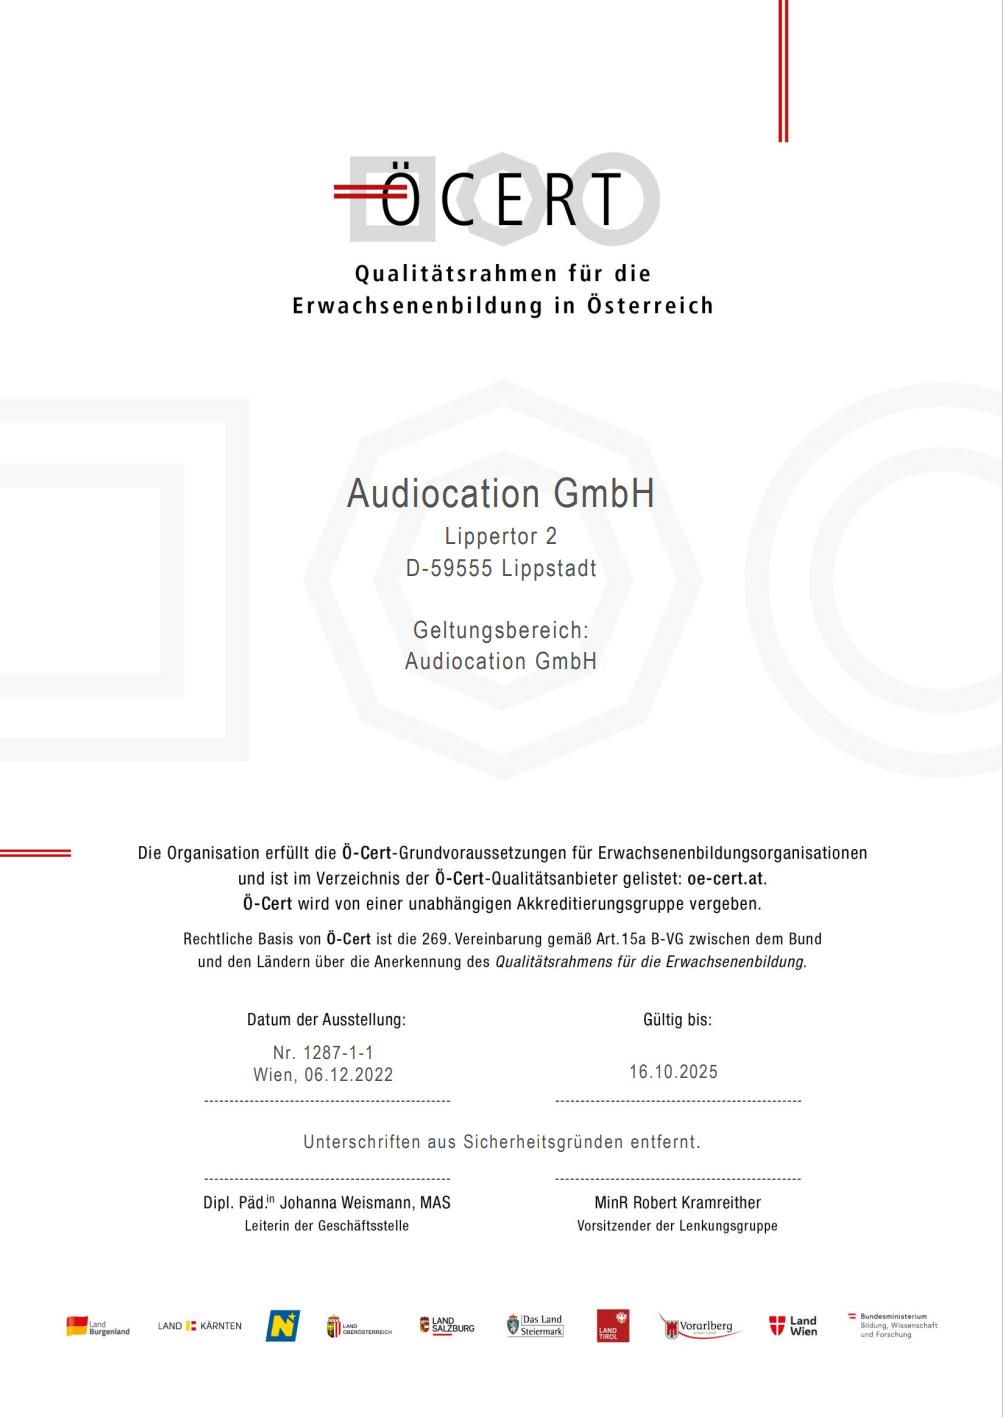 Ö-Cert Zertifikat Audiocation GmbH